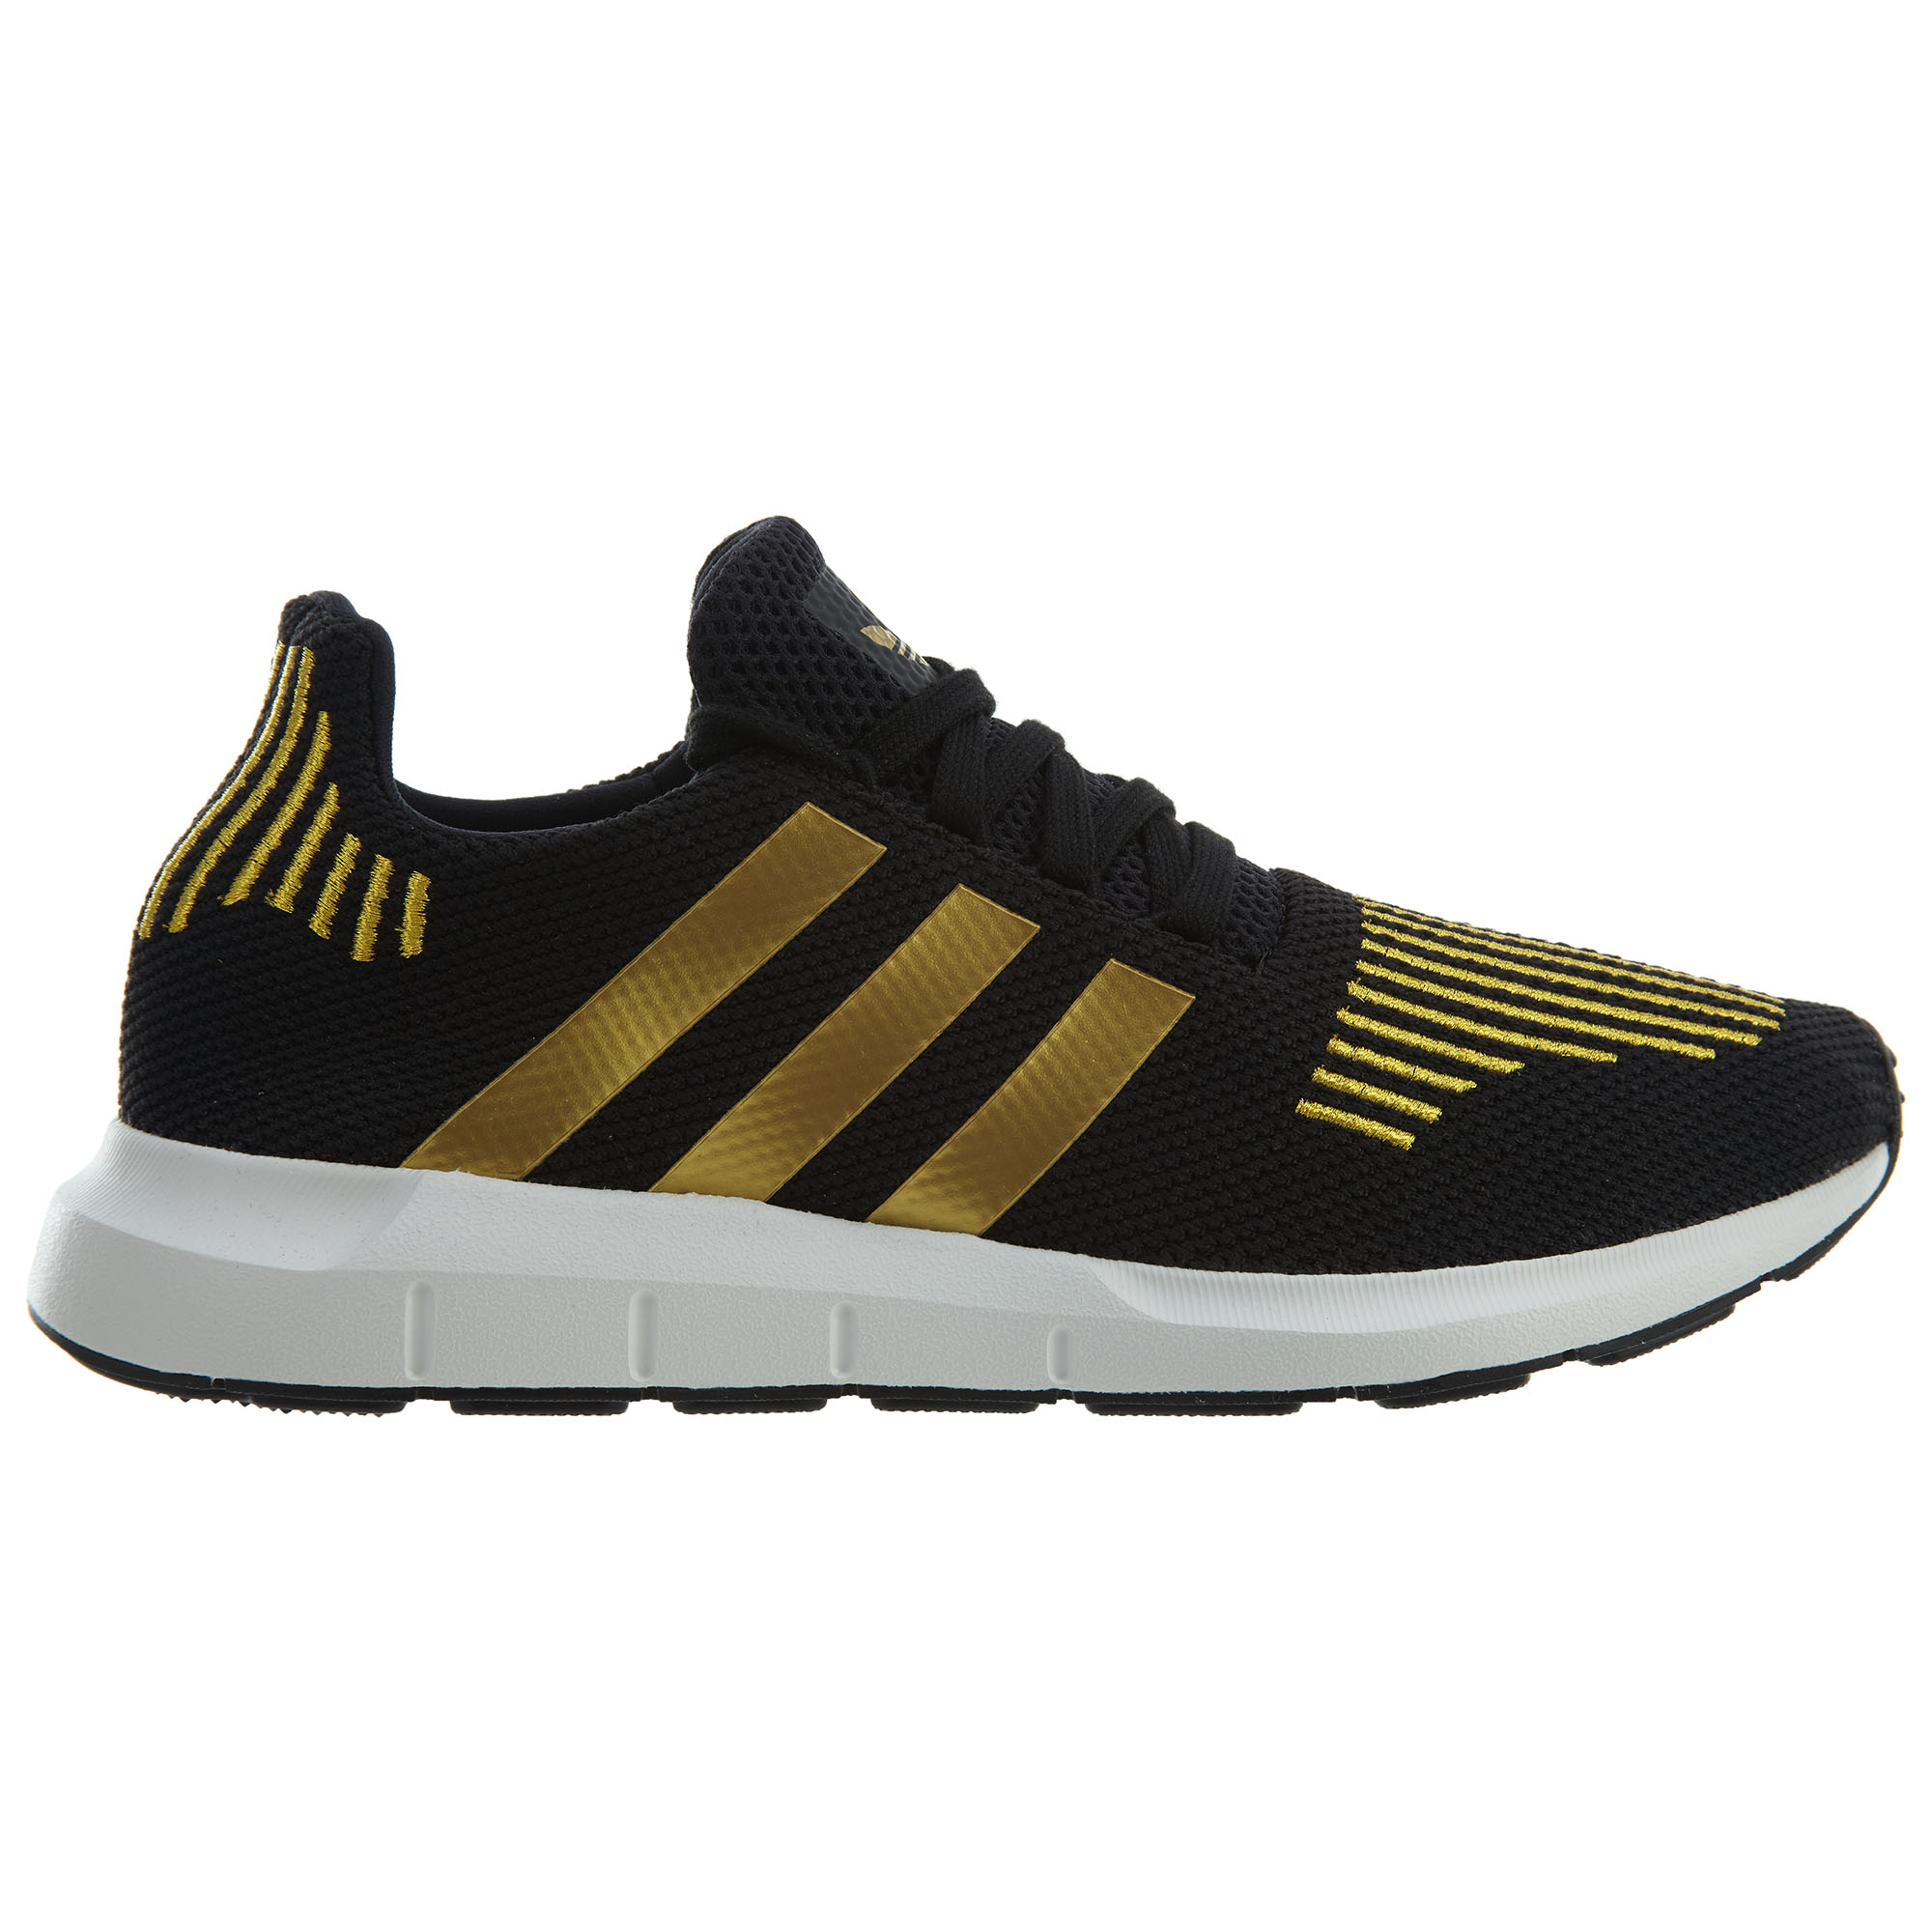 adidas Swift Run Black Gold Metallic